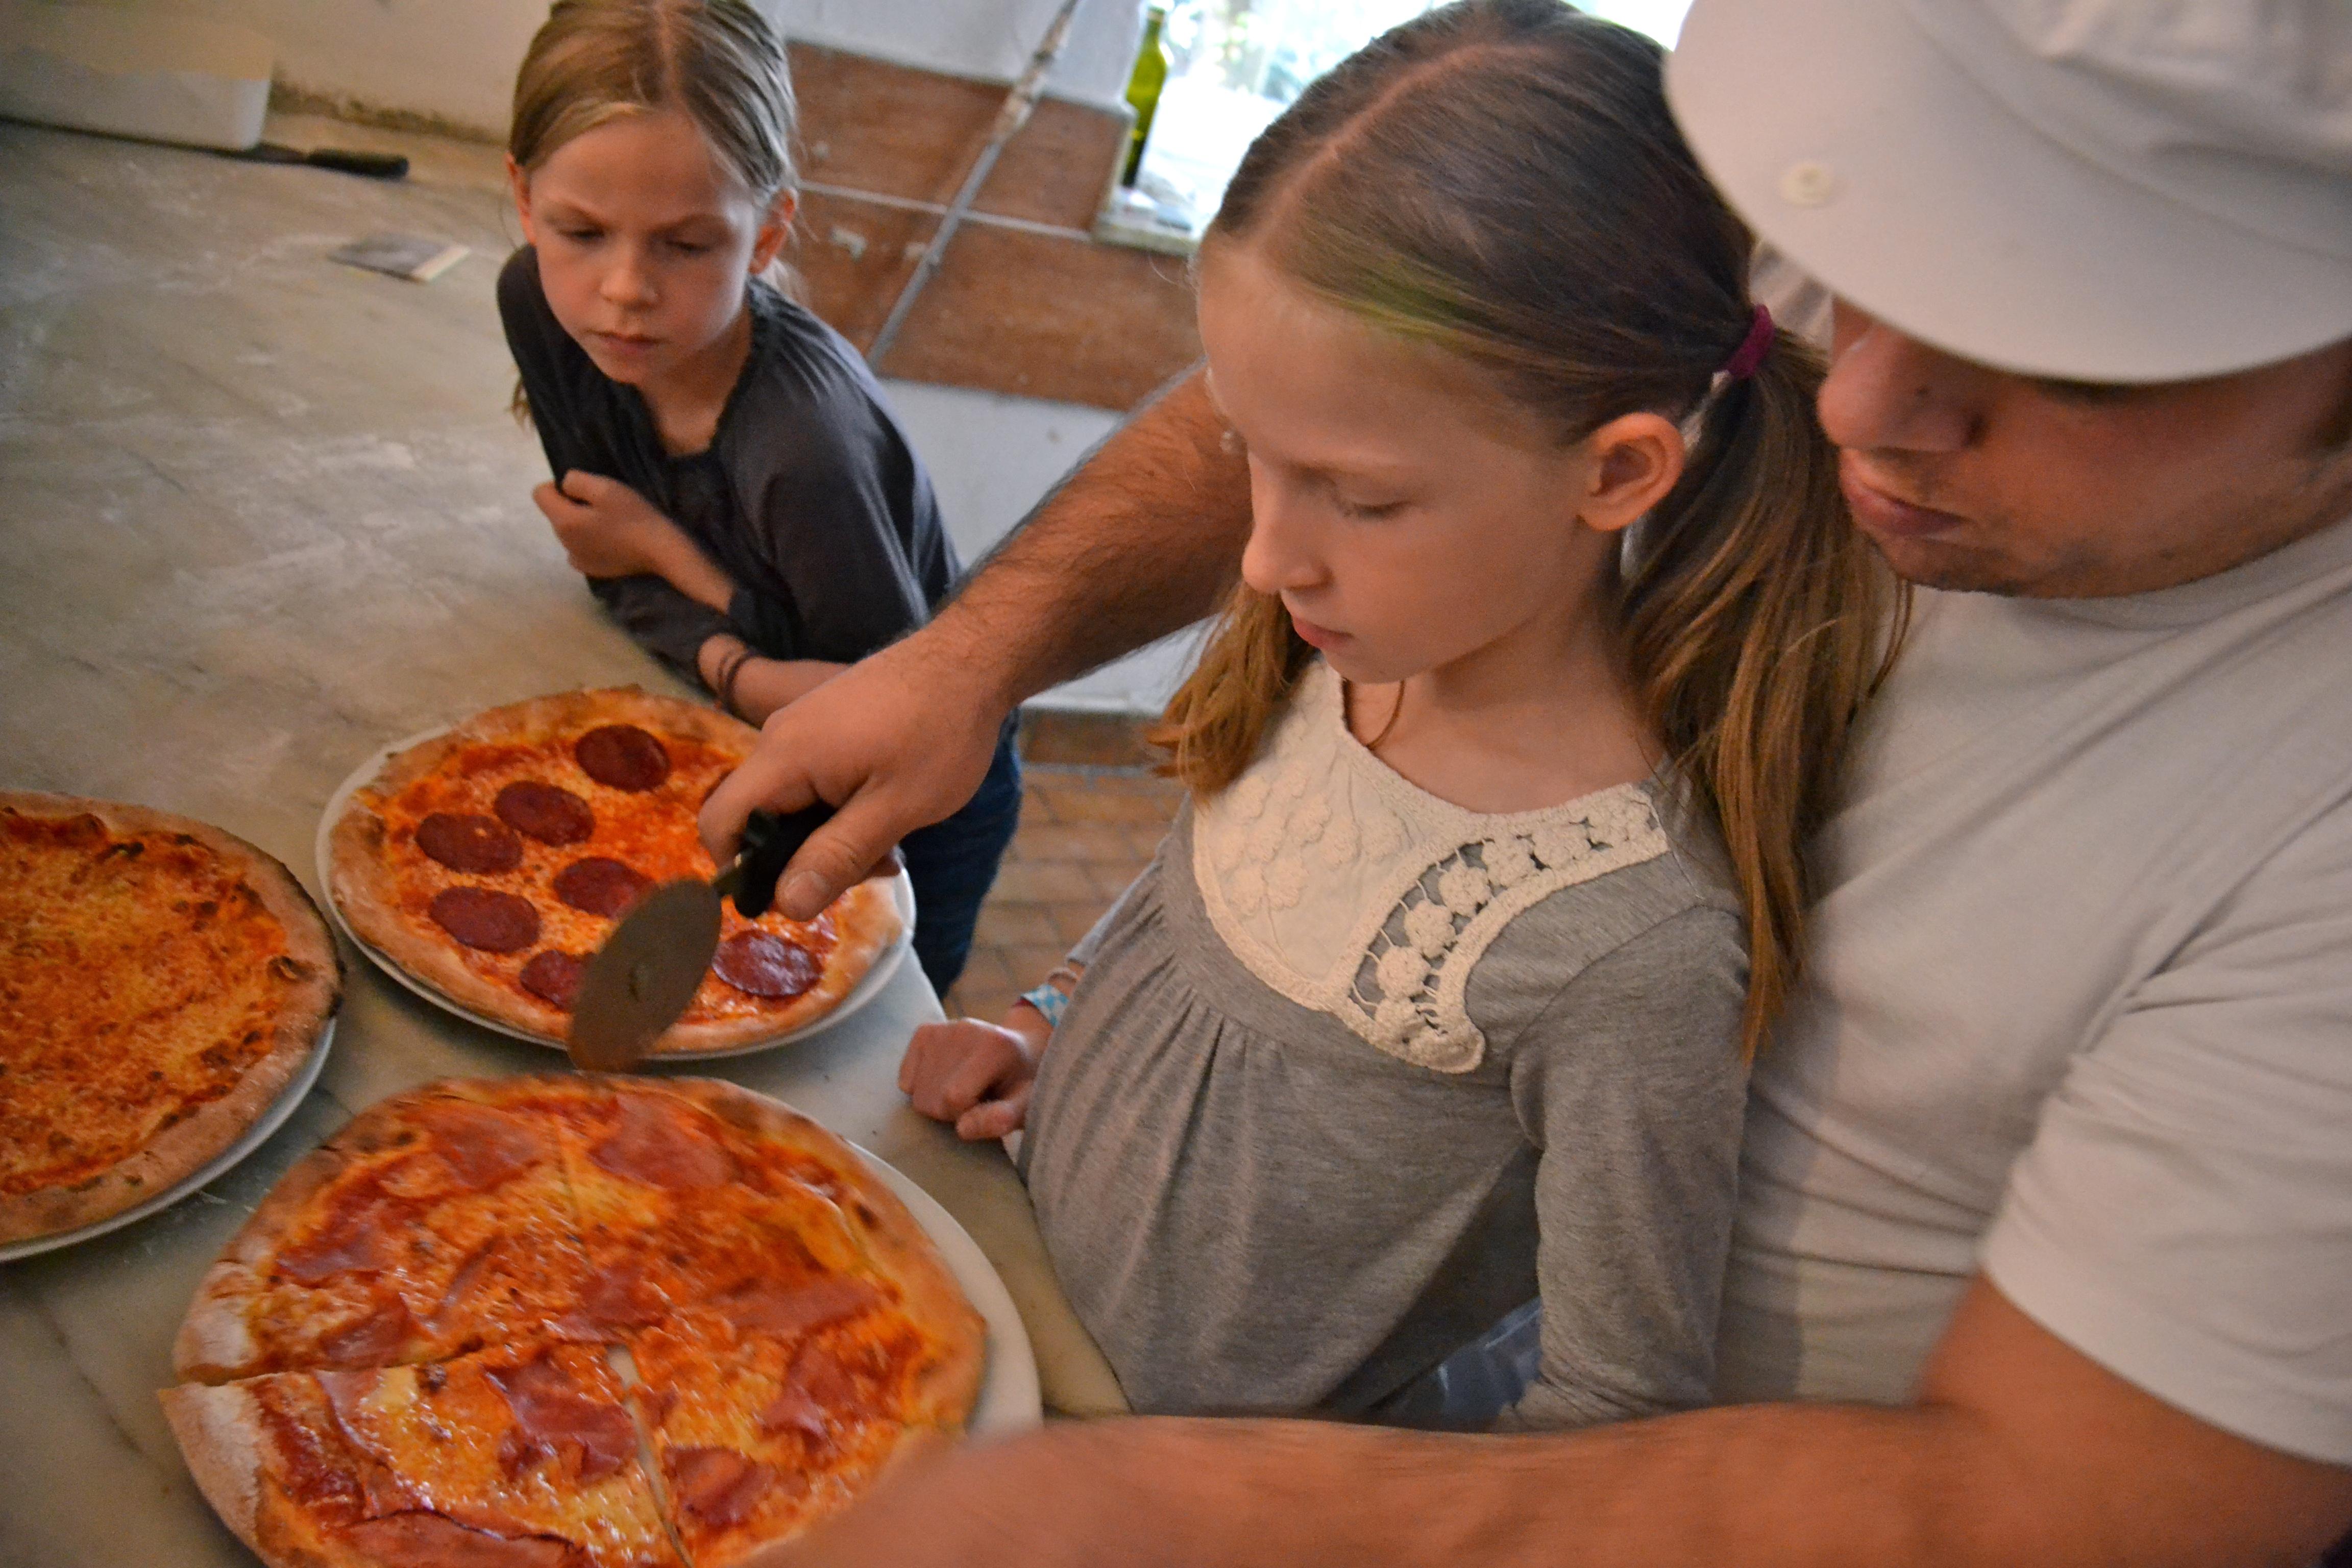 Kinderpizza - Francesco schneidet die Pizza in Stücke